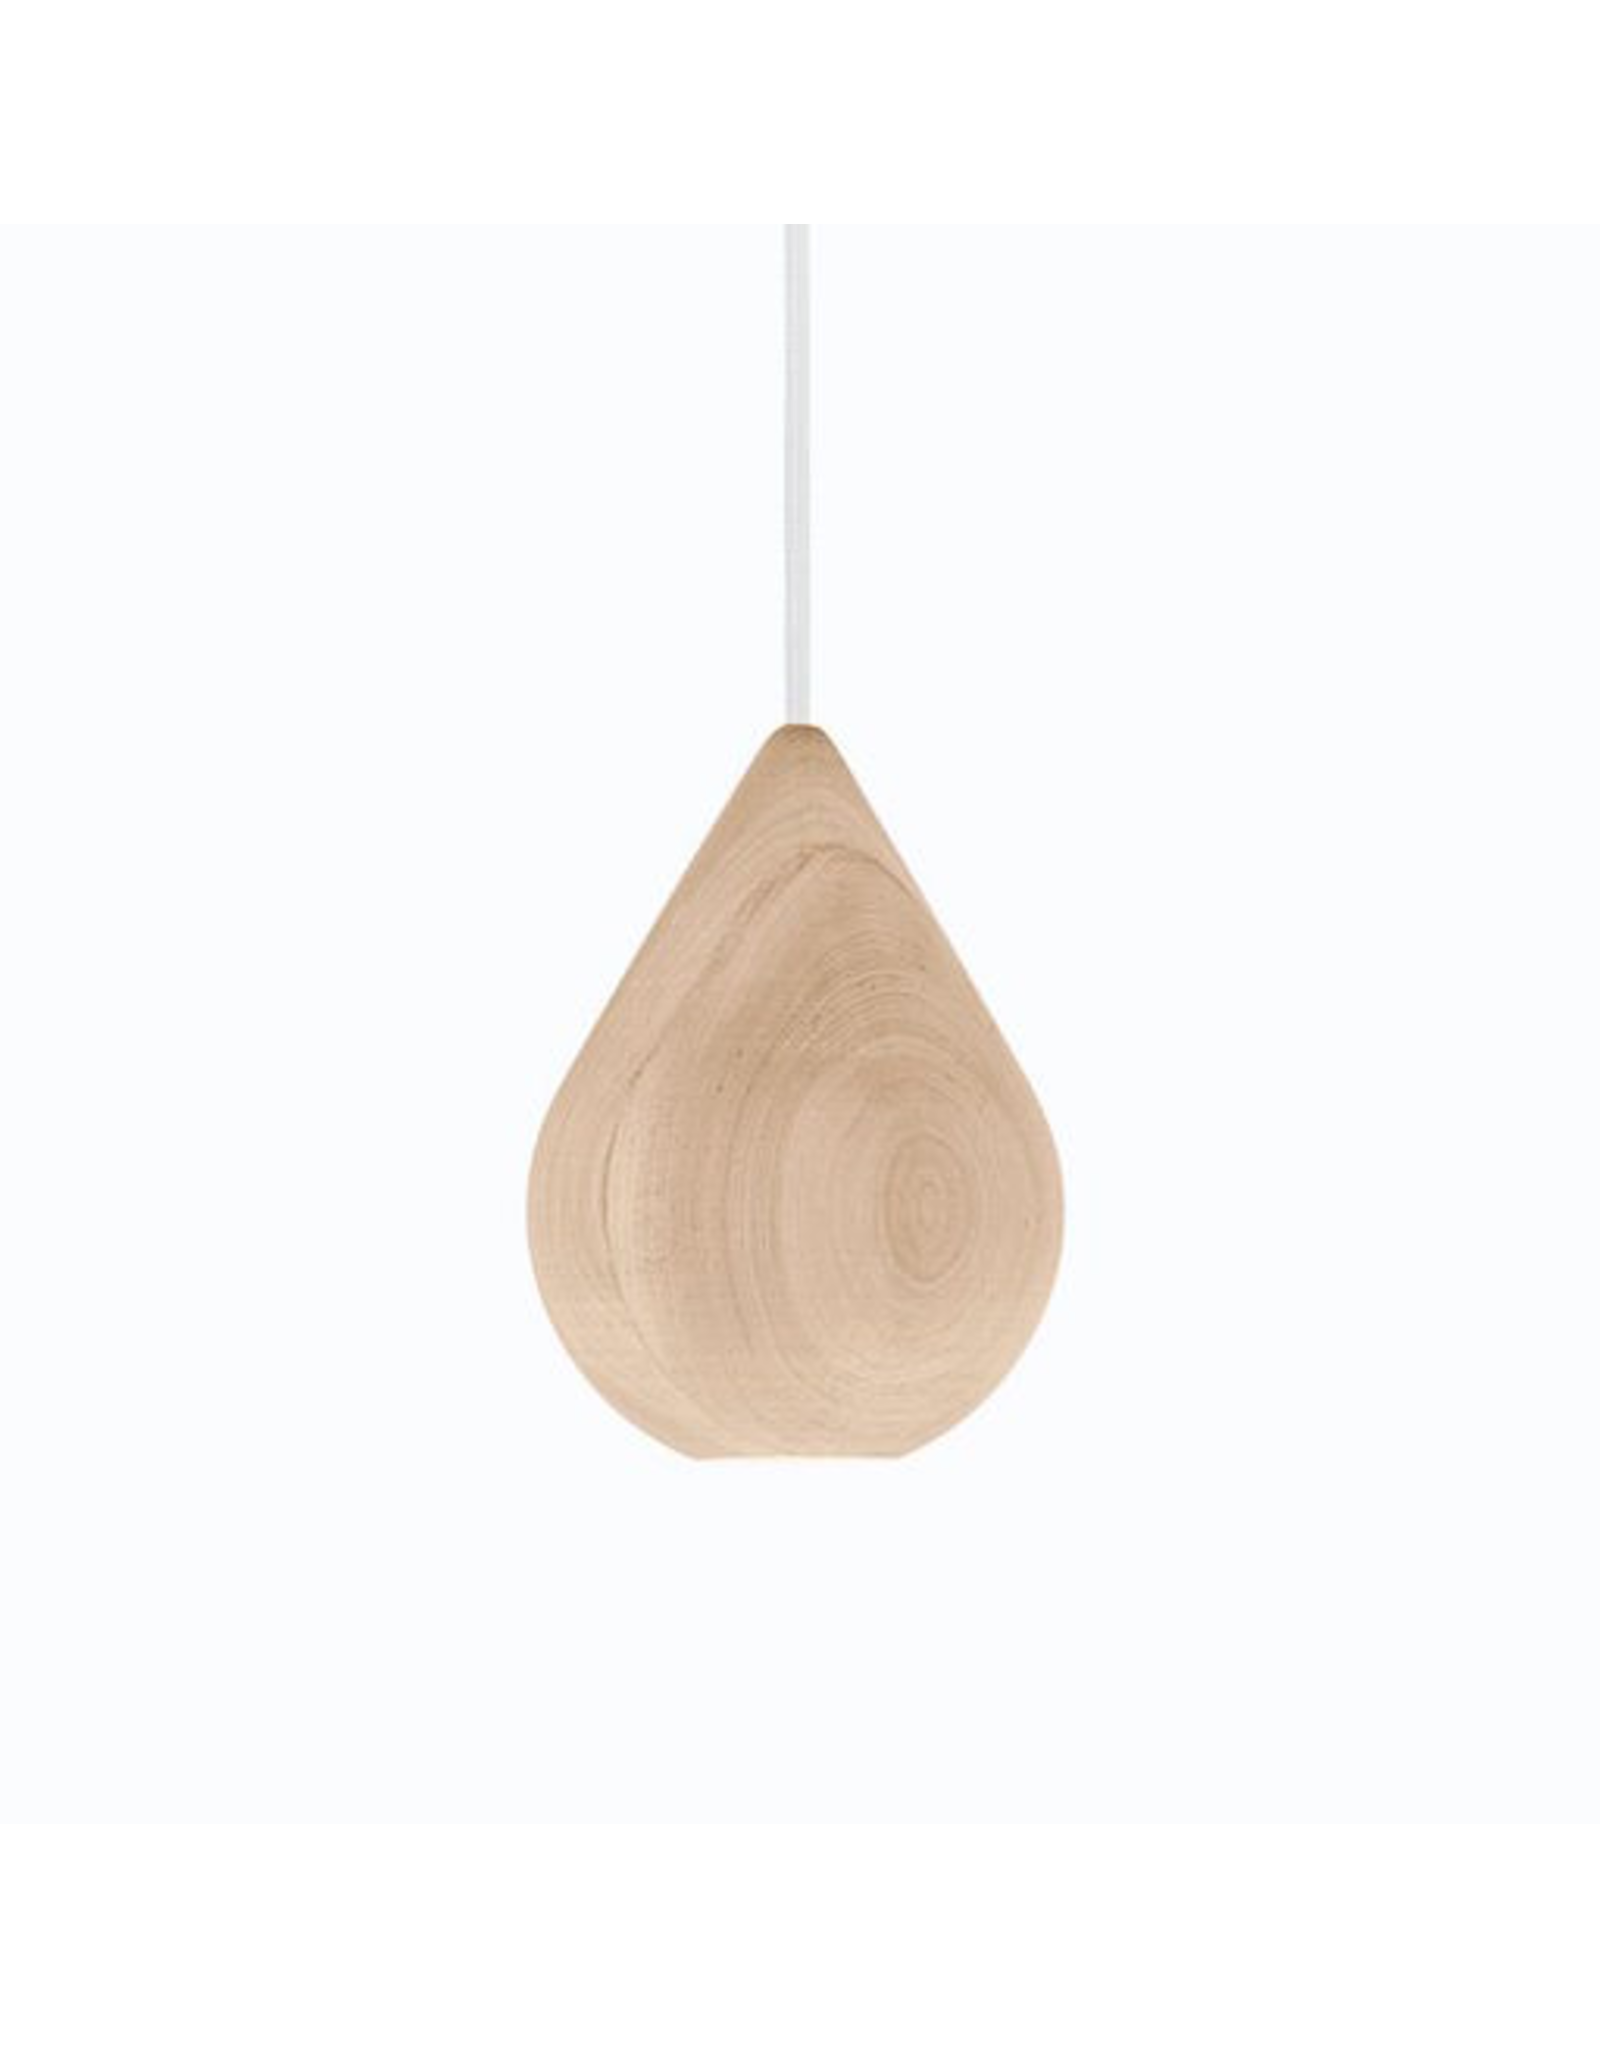 LIUKU BASE 水滴形橡木吊燈